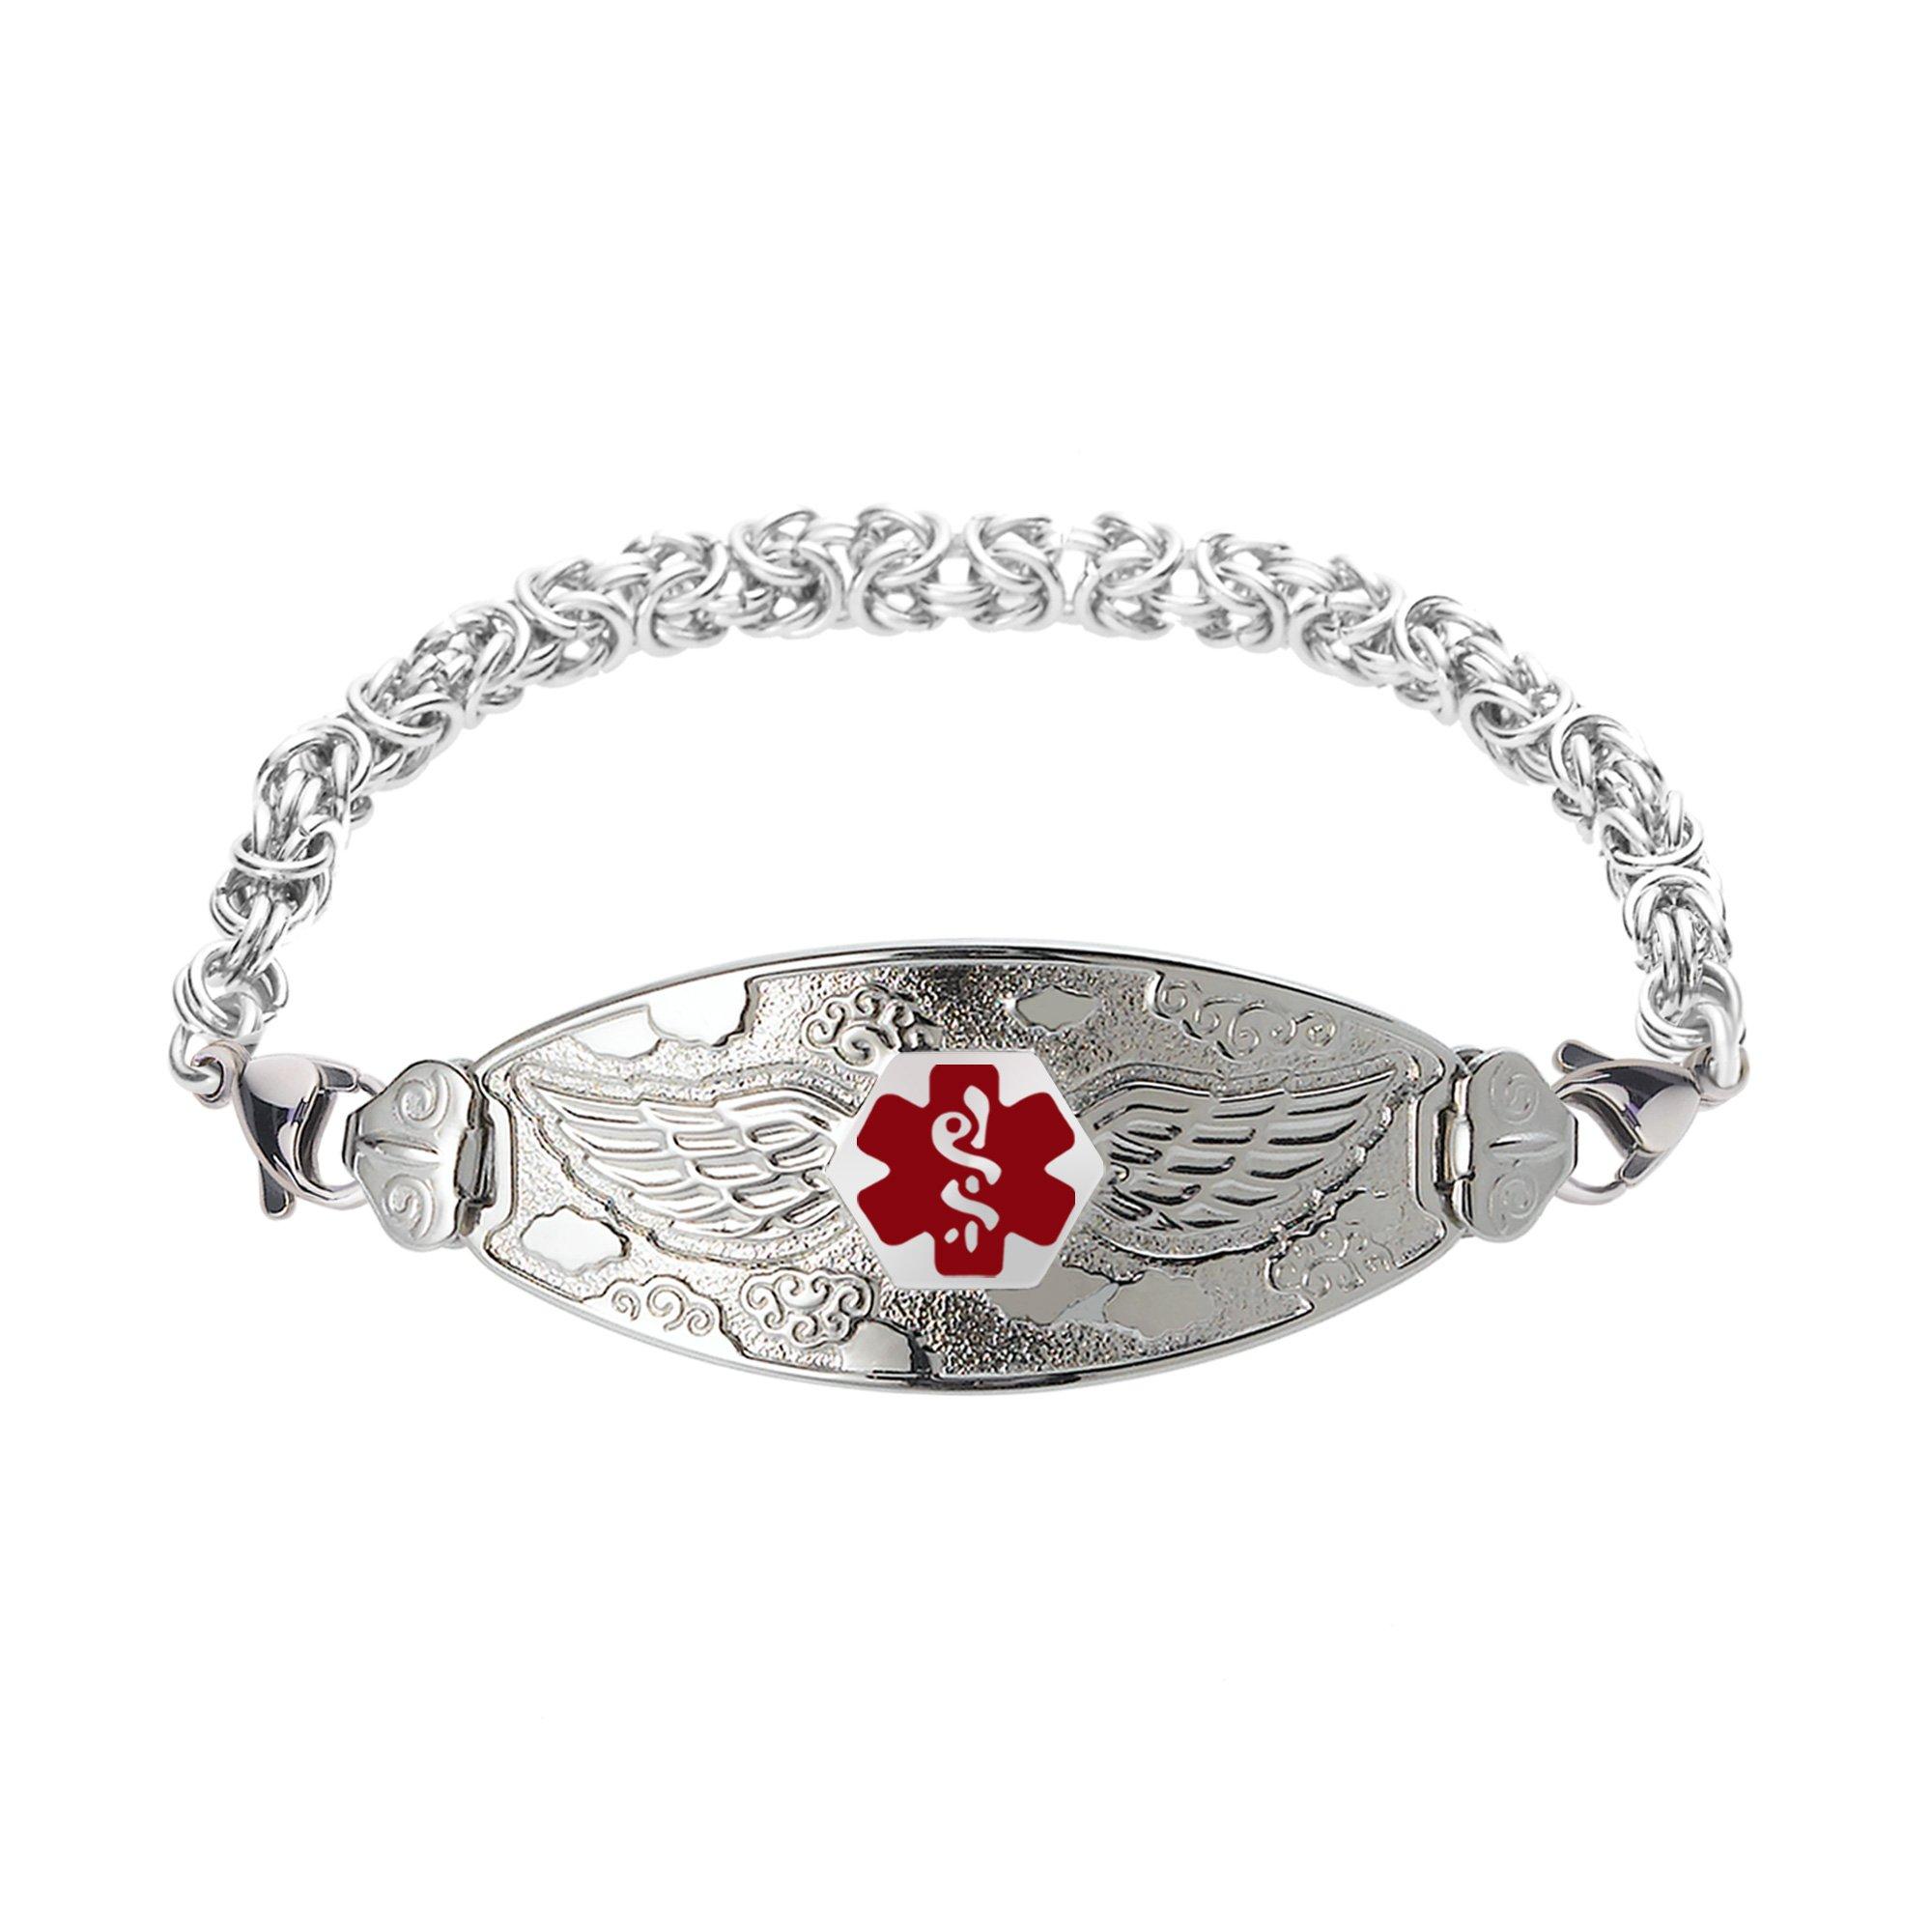 Divoti Custom Engraved Angel Wing Medical Alert Bracelet -Handmade Byzantine -Red-6.5''